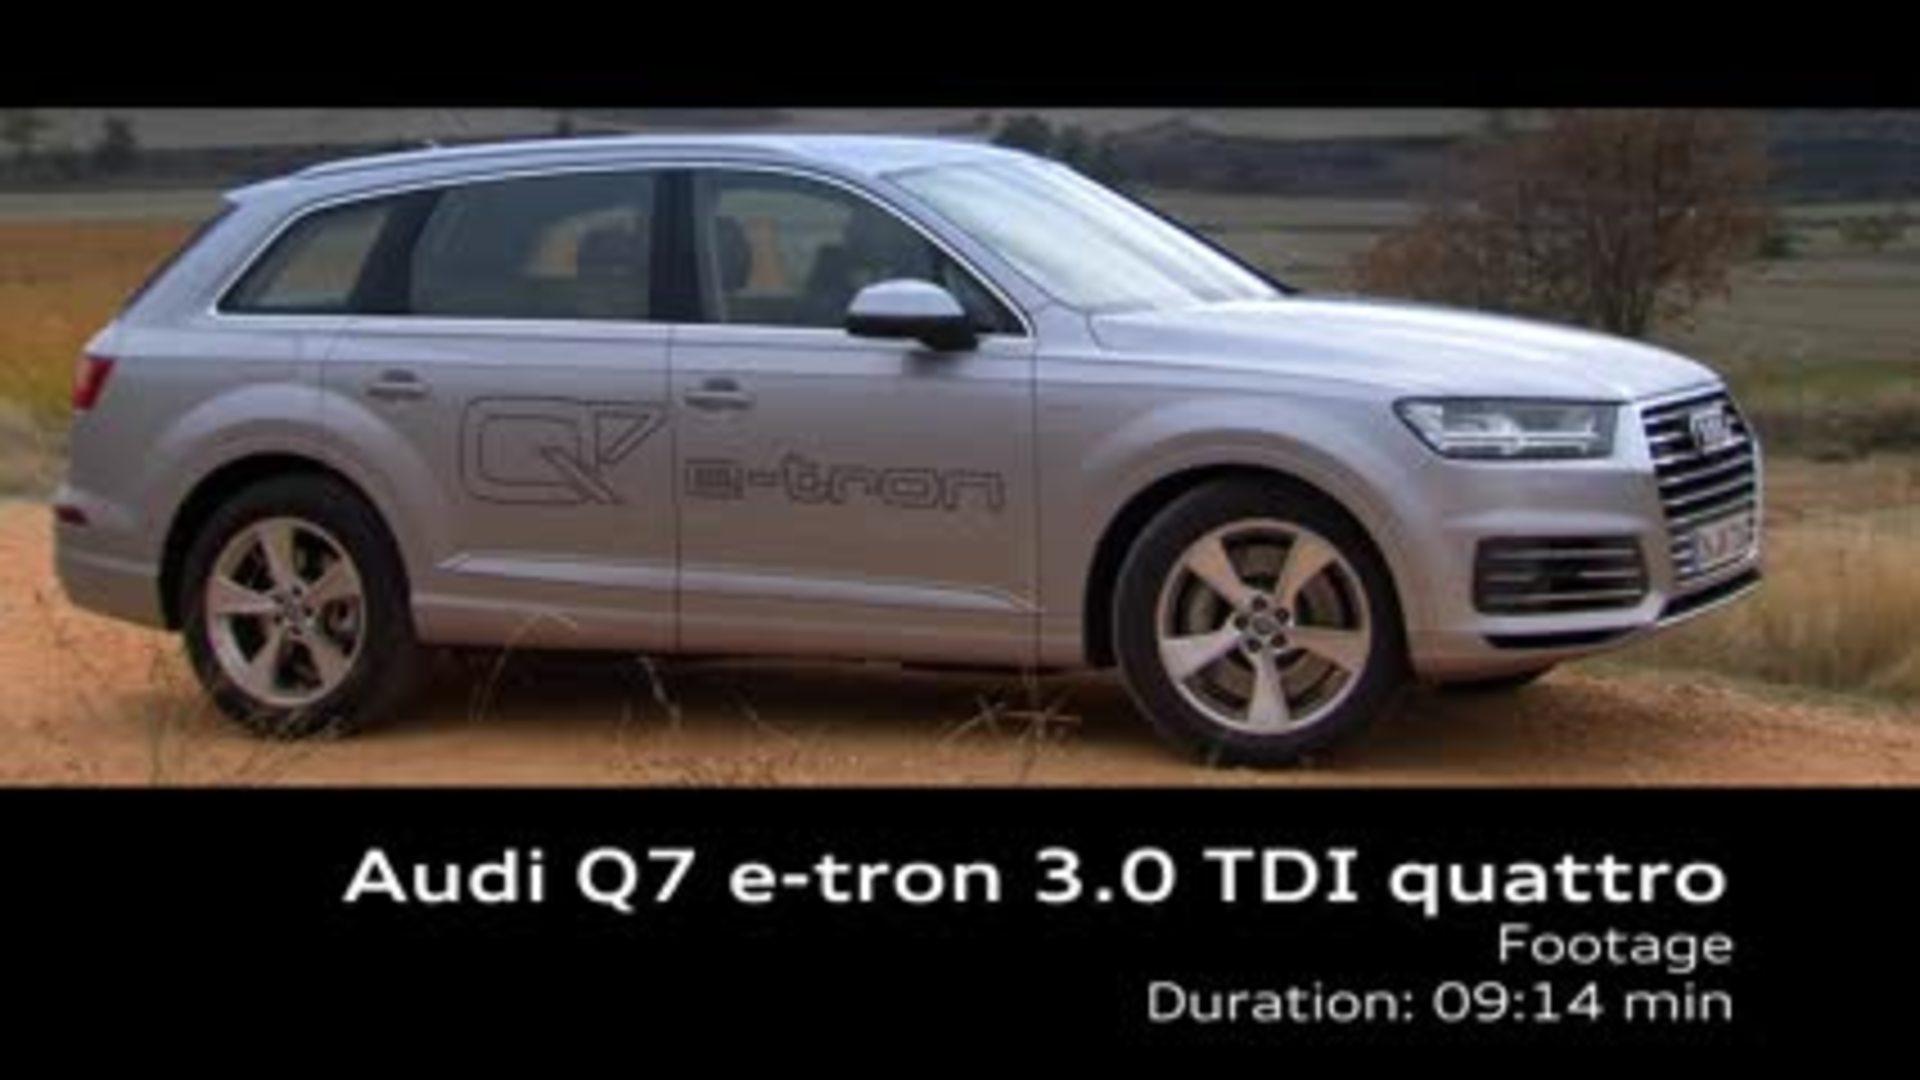 Audi Q7 e-tron 3.0 TDI quattro - Footage